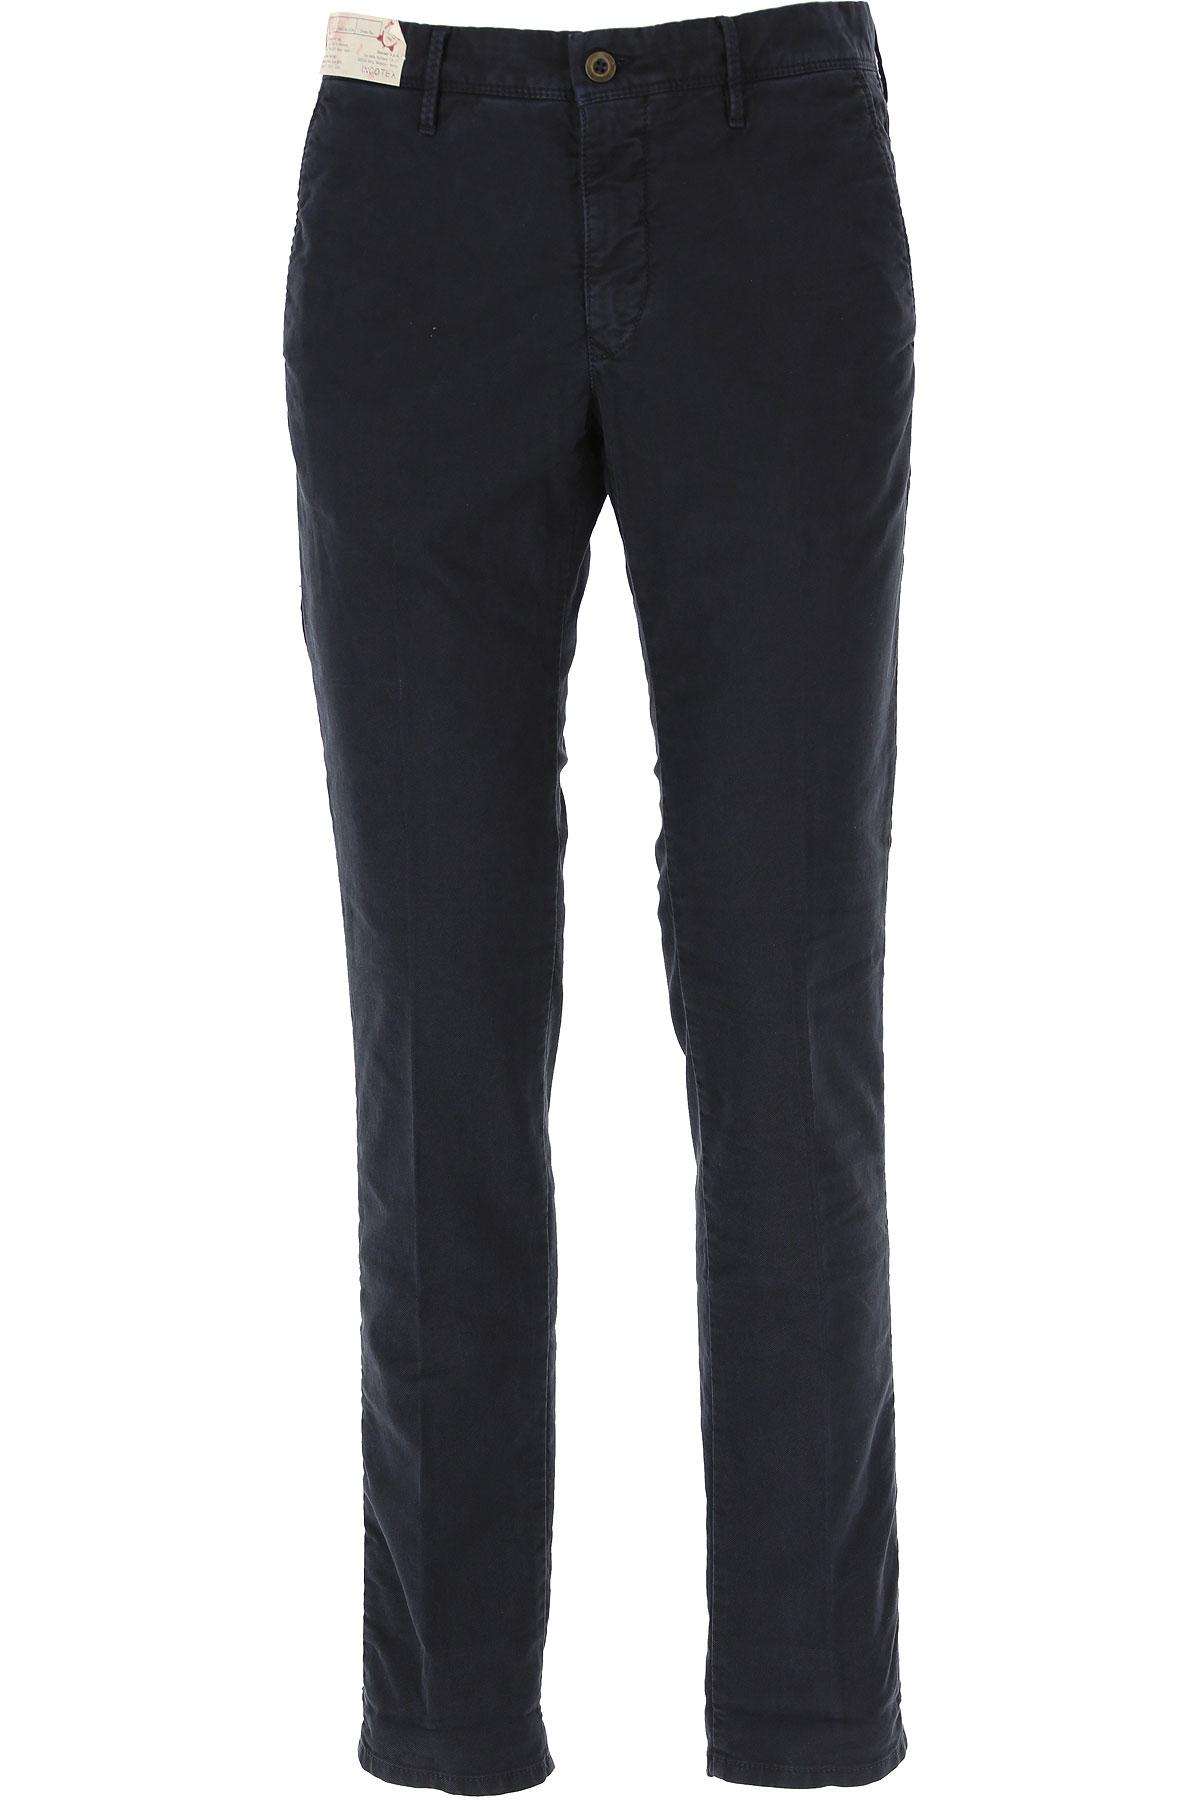 Incotex Pants for Men On Sale, Dark Blue, Cotton, 2019, 32 33 35 36